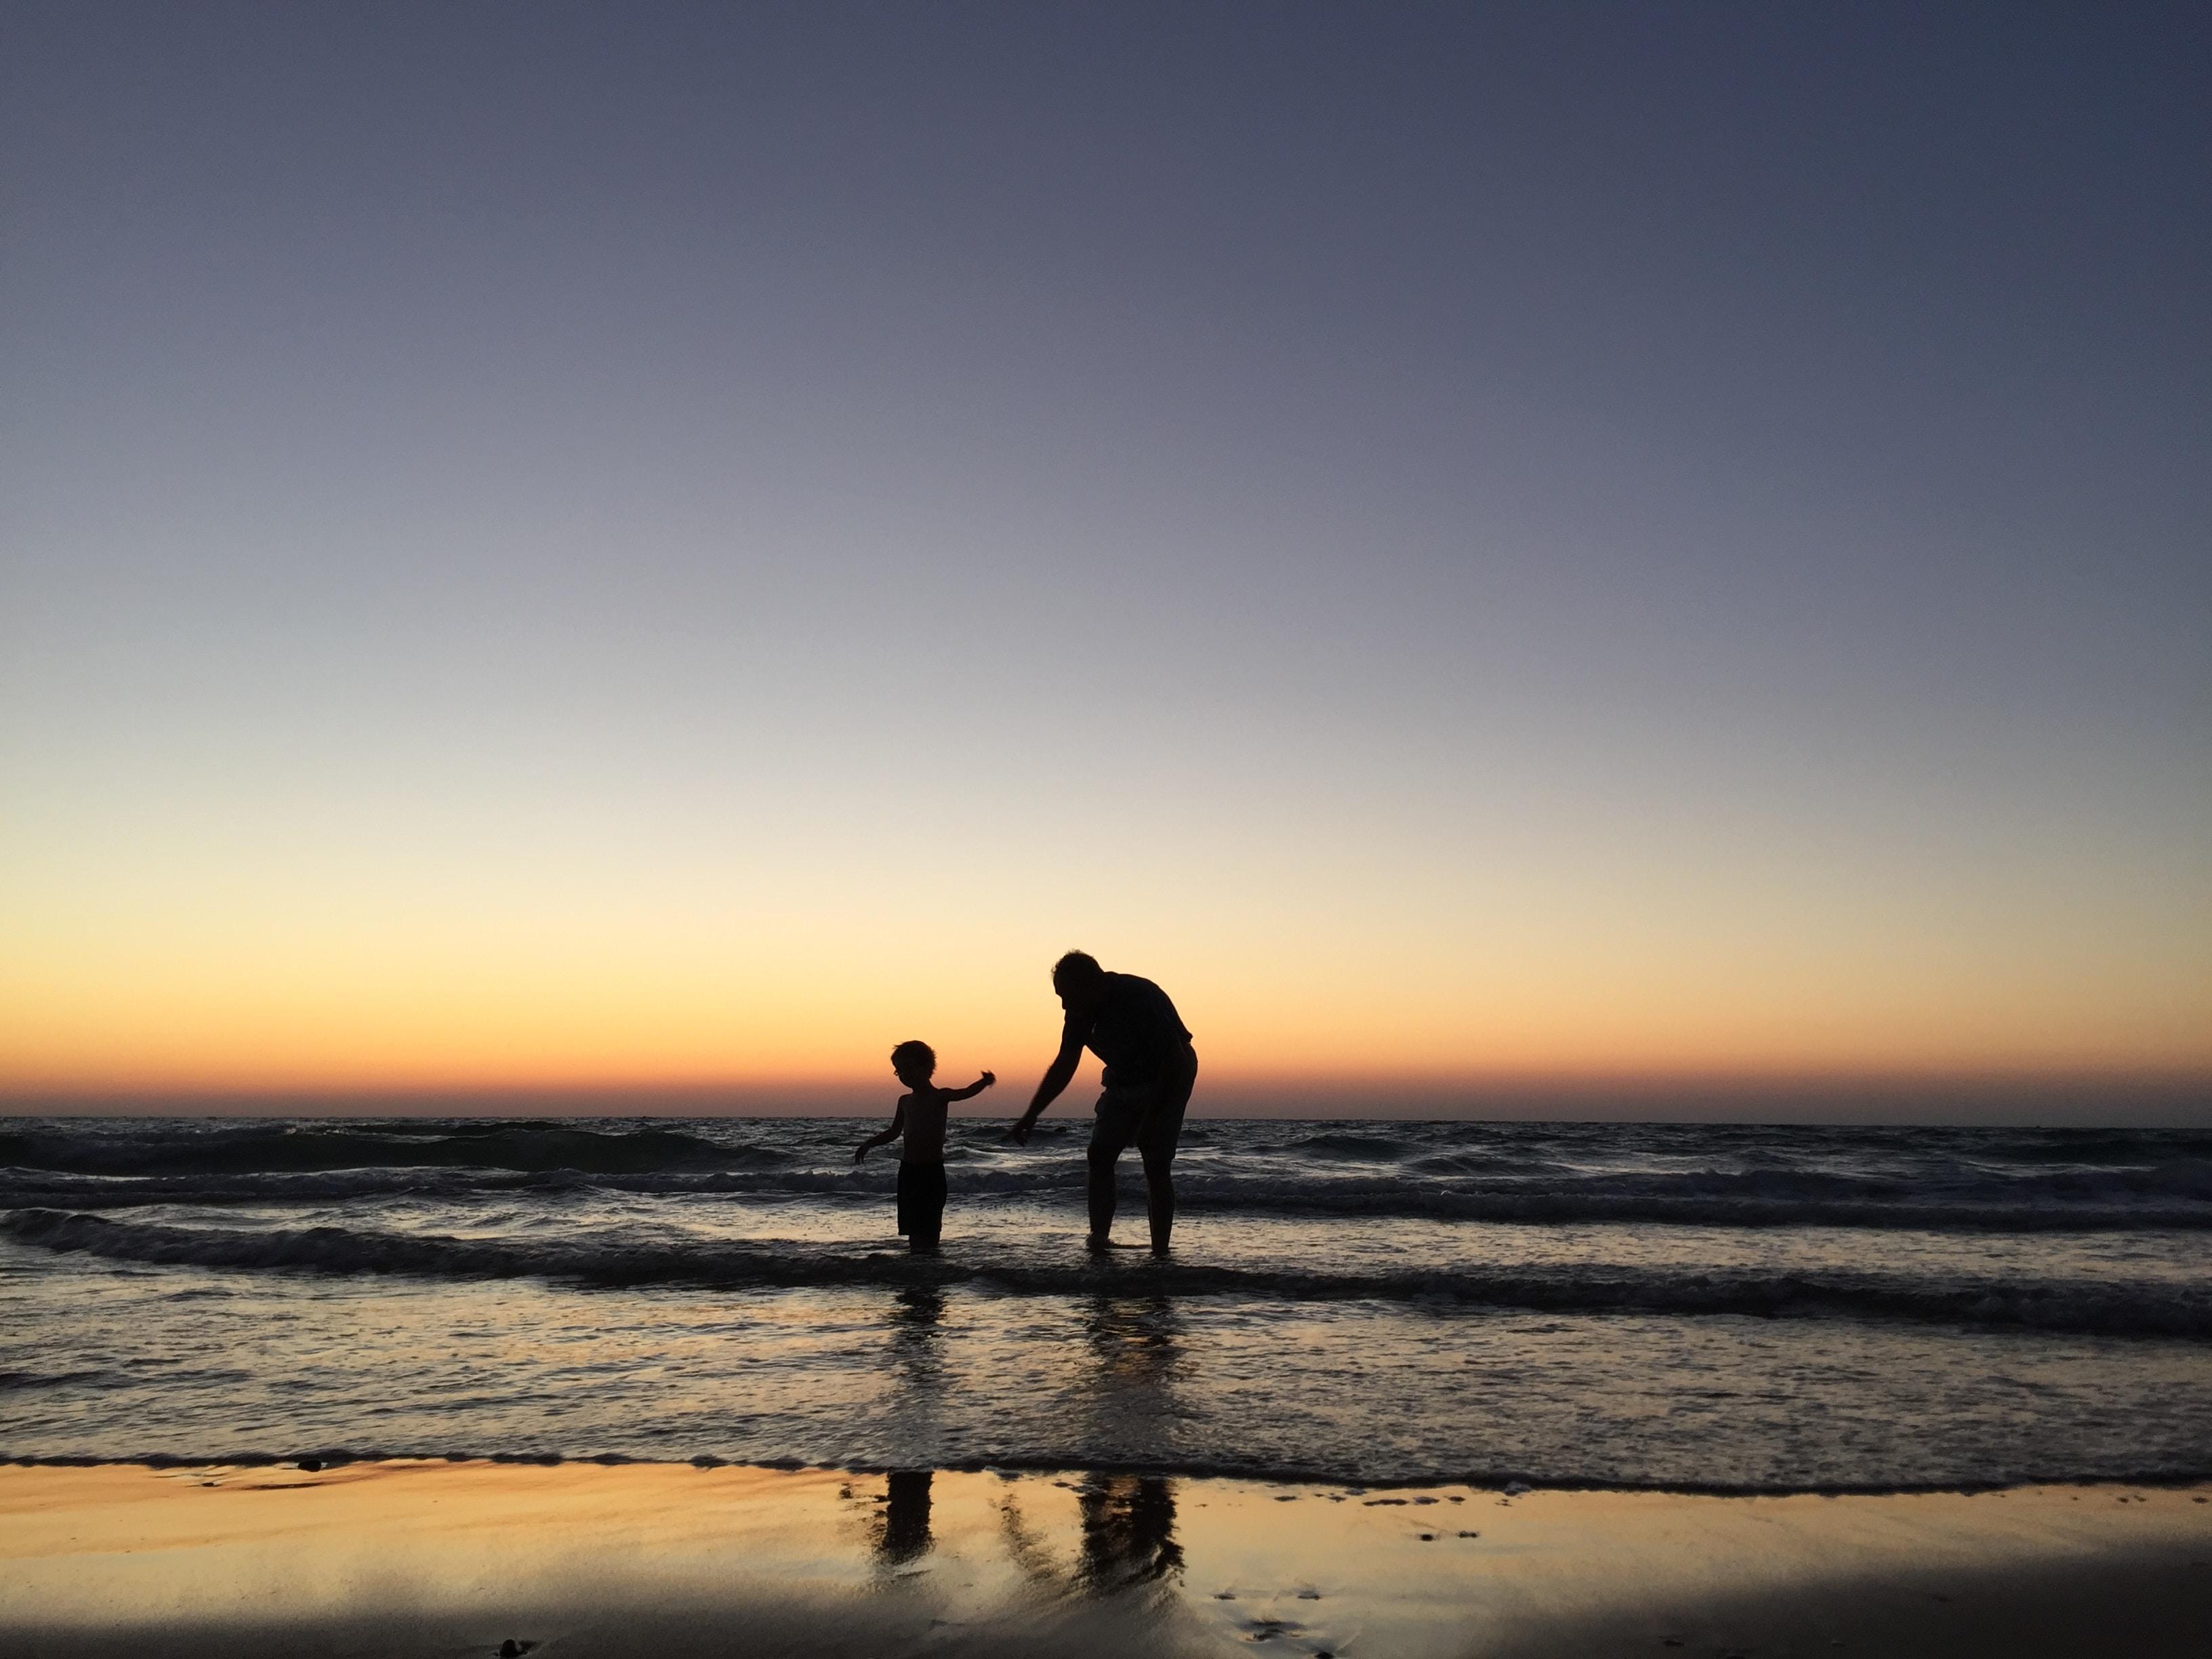 silhouette of man and kid on seashore